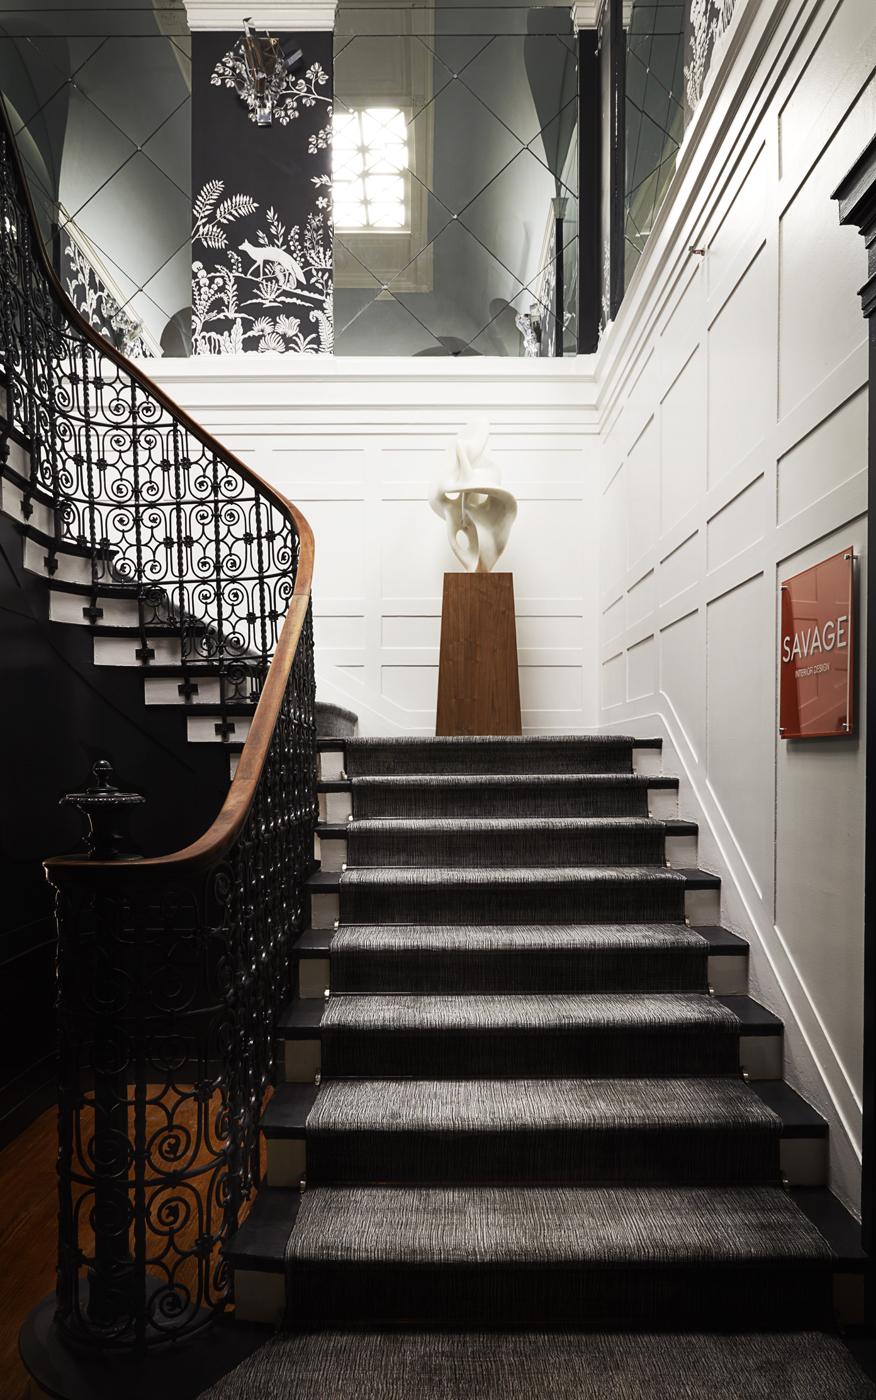 Staircase white paneled walls; Patterson Flynn & Martin runner; mirrored niche insets in harlequin pattern | Savage Interior Design